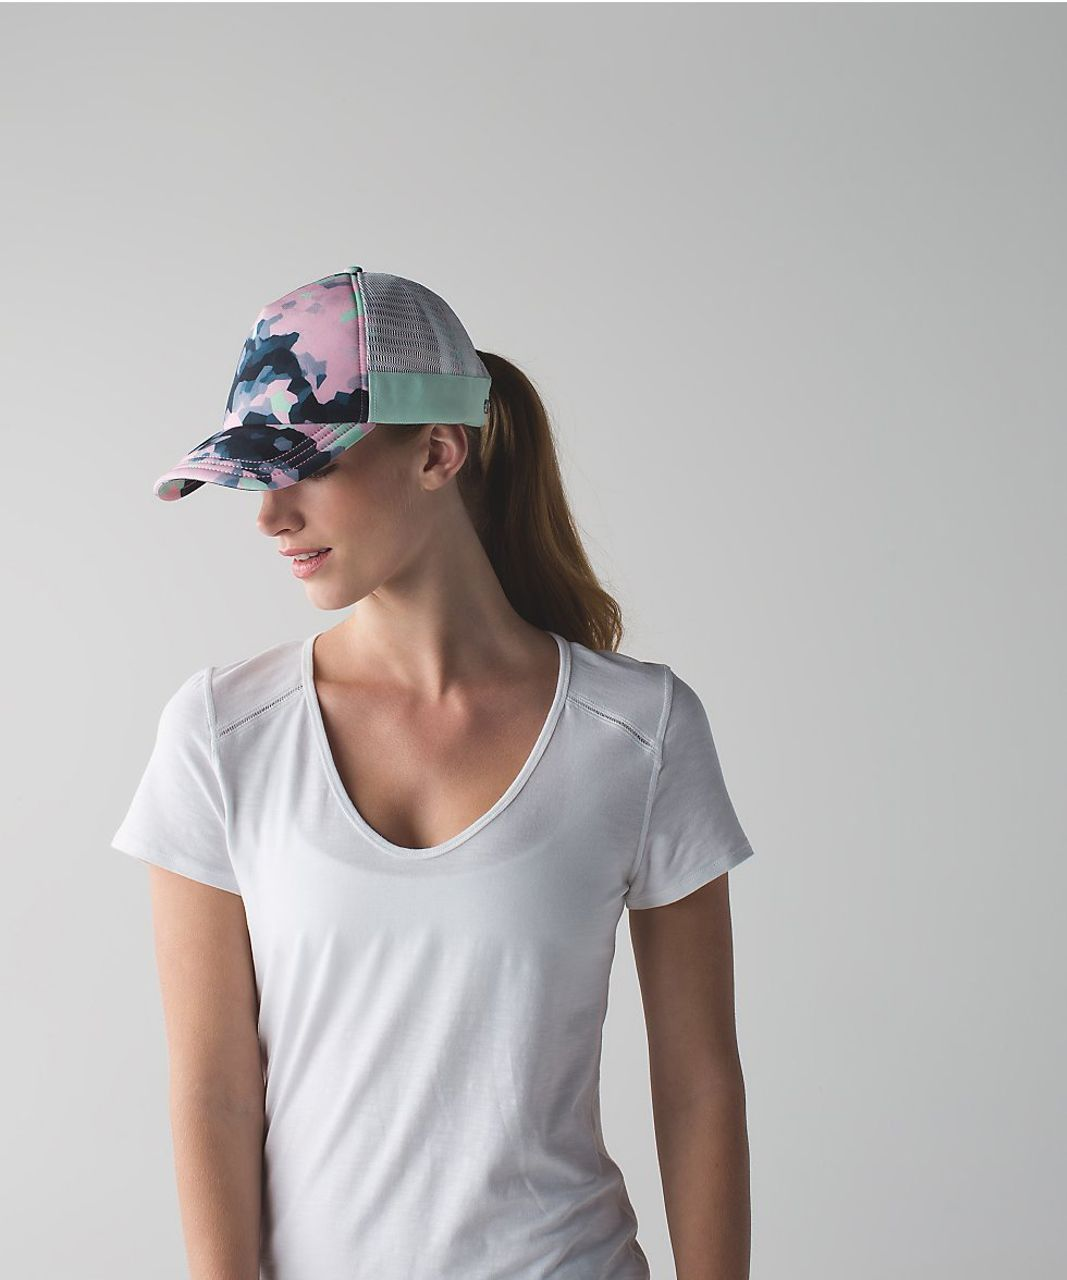 Lululemon What'SUP Hat - Clouded Dreams Multi / Sea Mist